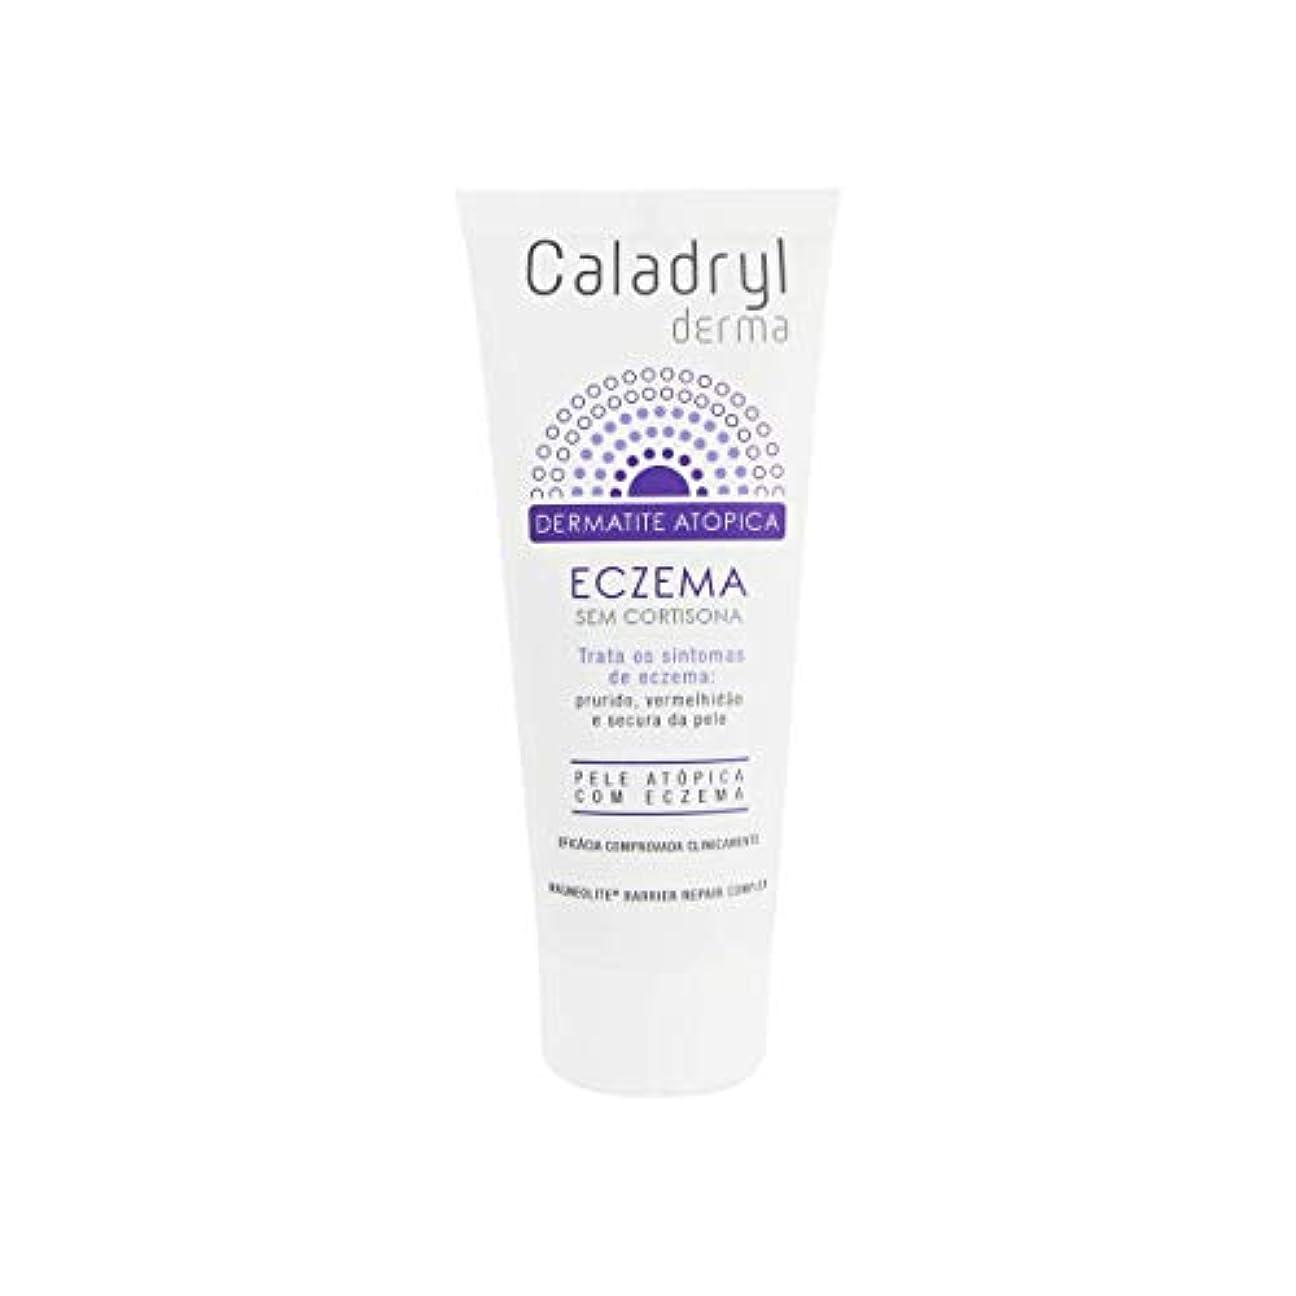 社会主義トークン上昇Caladryl Atopic Dermatitis Eczema 30g